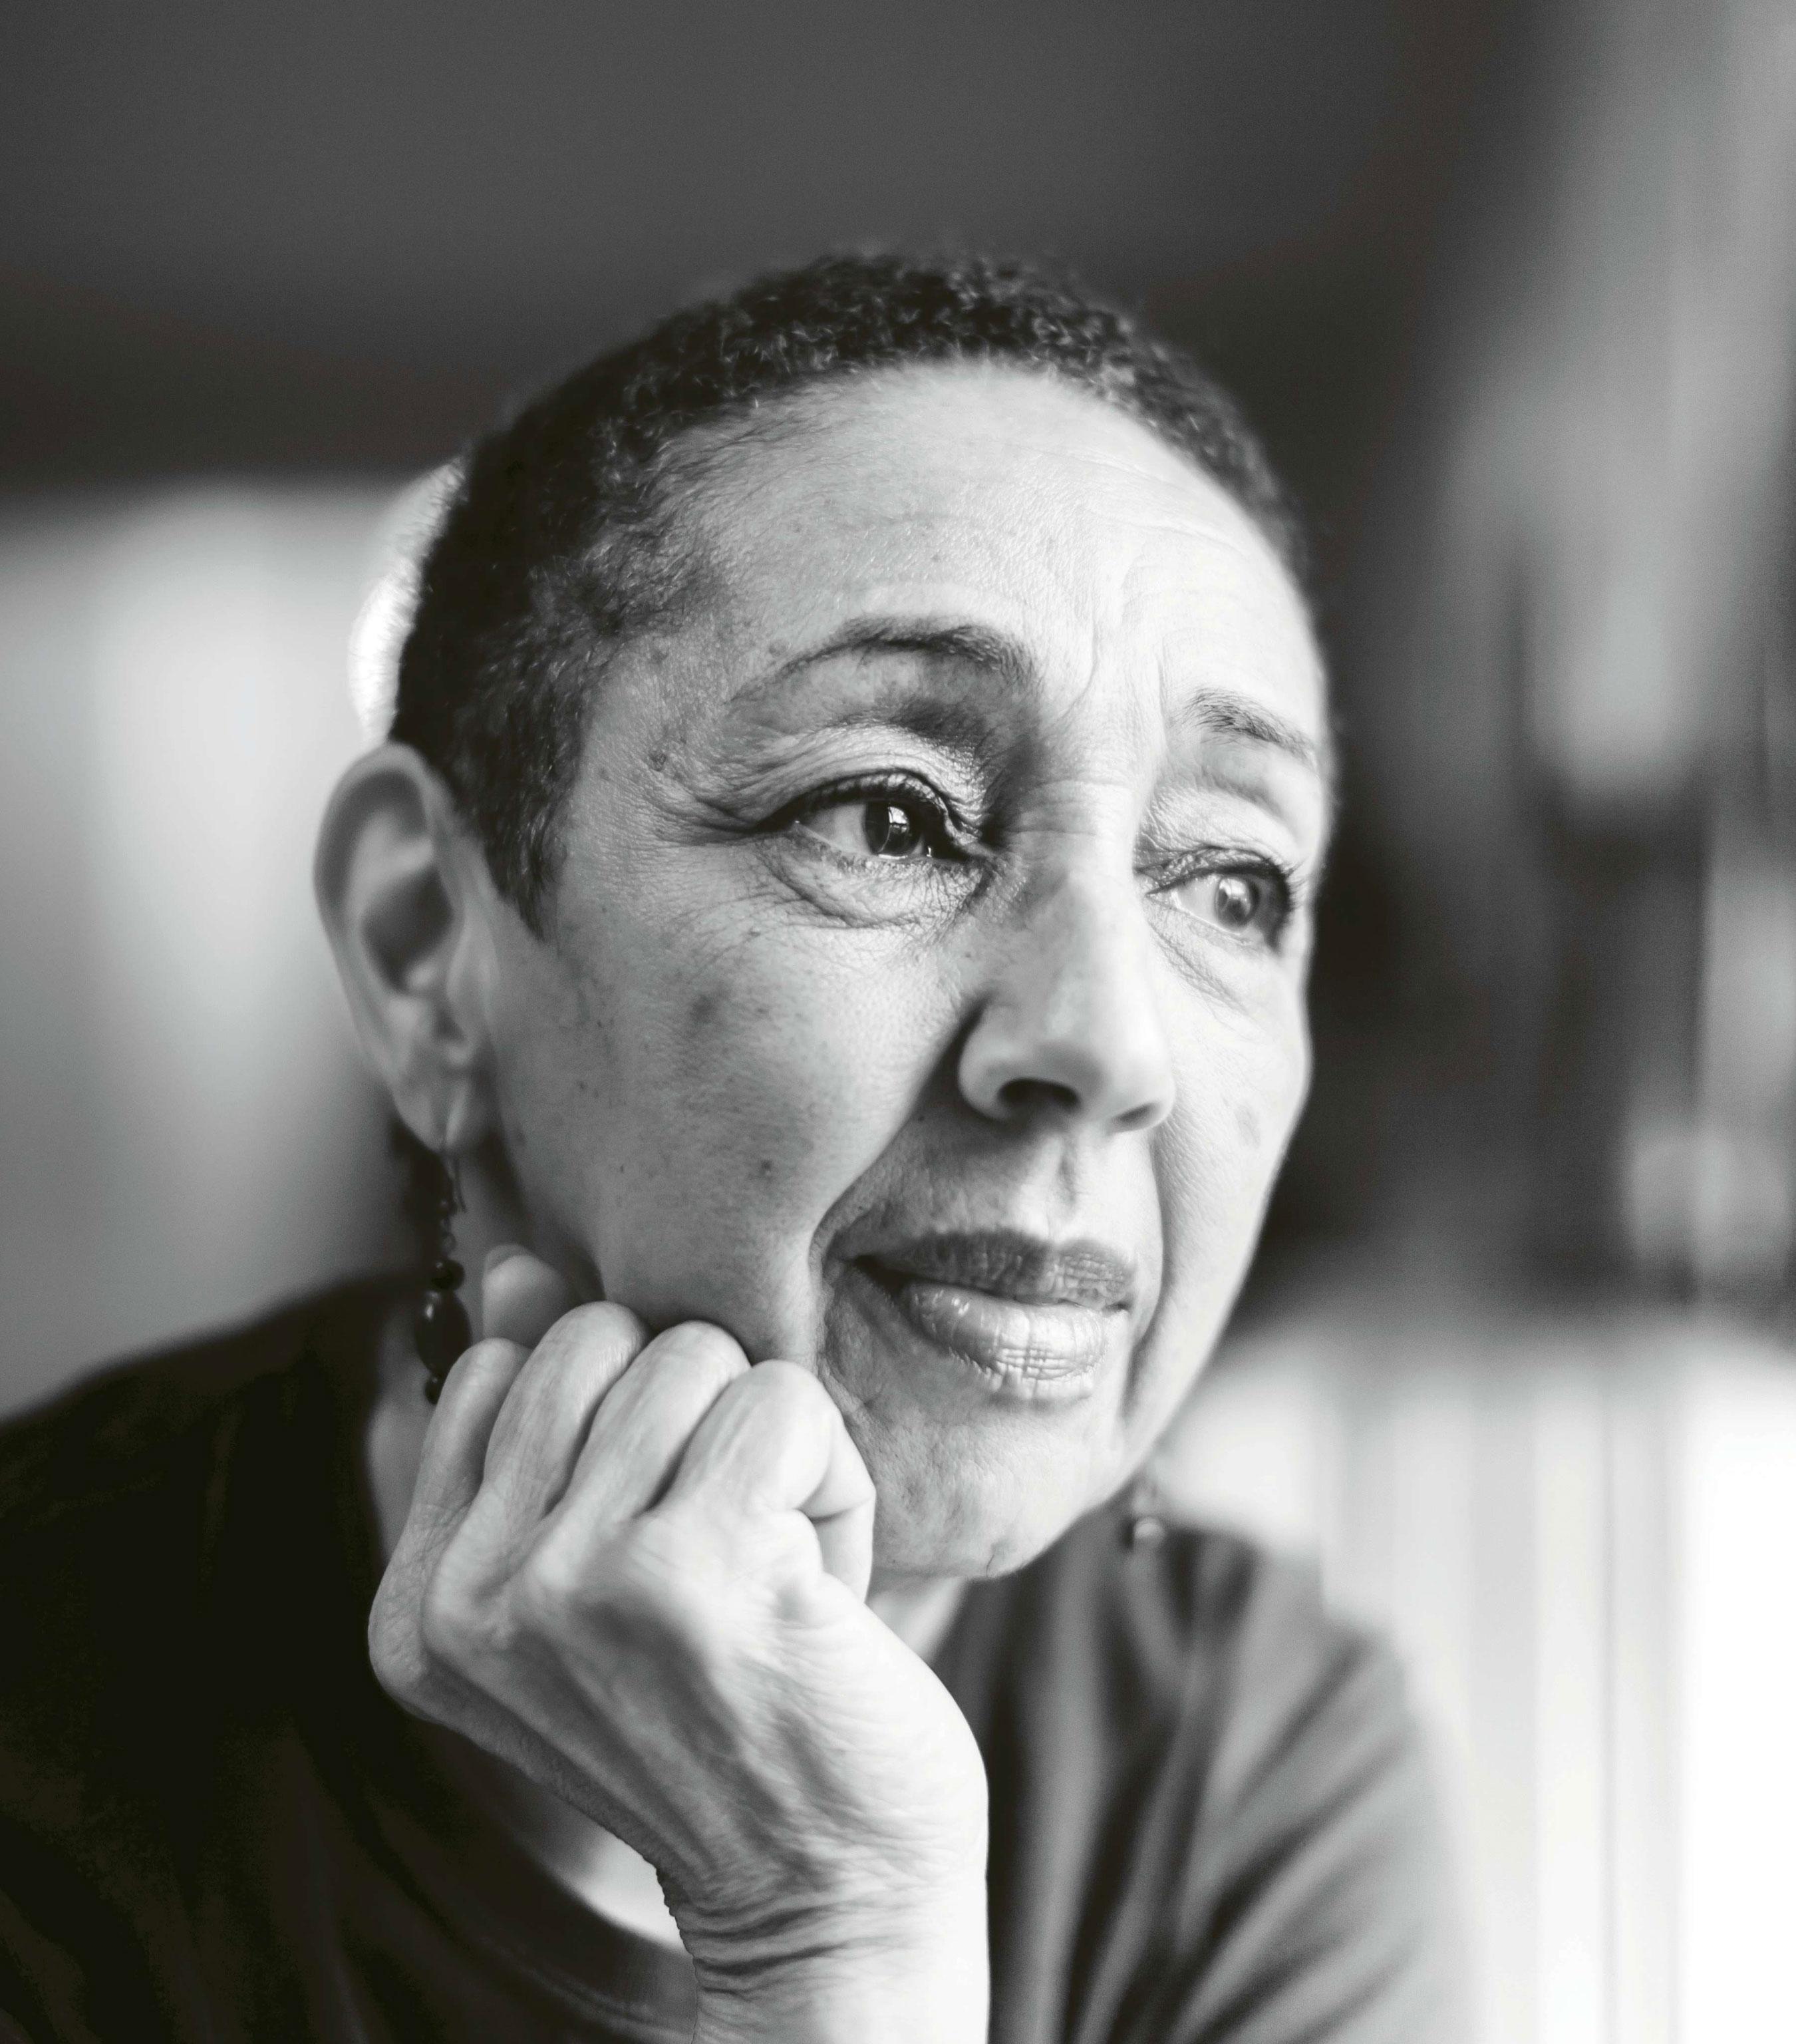 Millicent Brown, African American History, Black History, School Desegregation, Segregation, Linda Brown, KOLUMN Magazine, KOLUMN, KINDR'D Magazine, KINDR'D